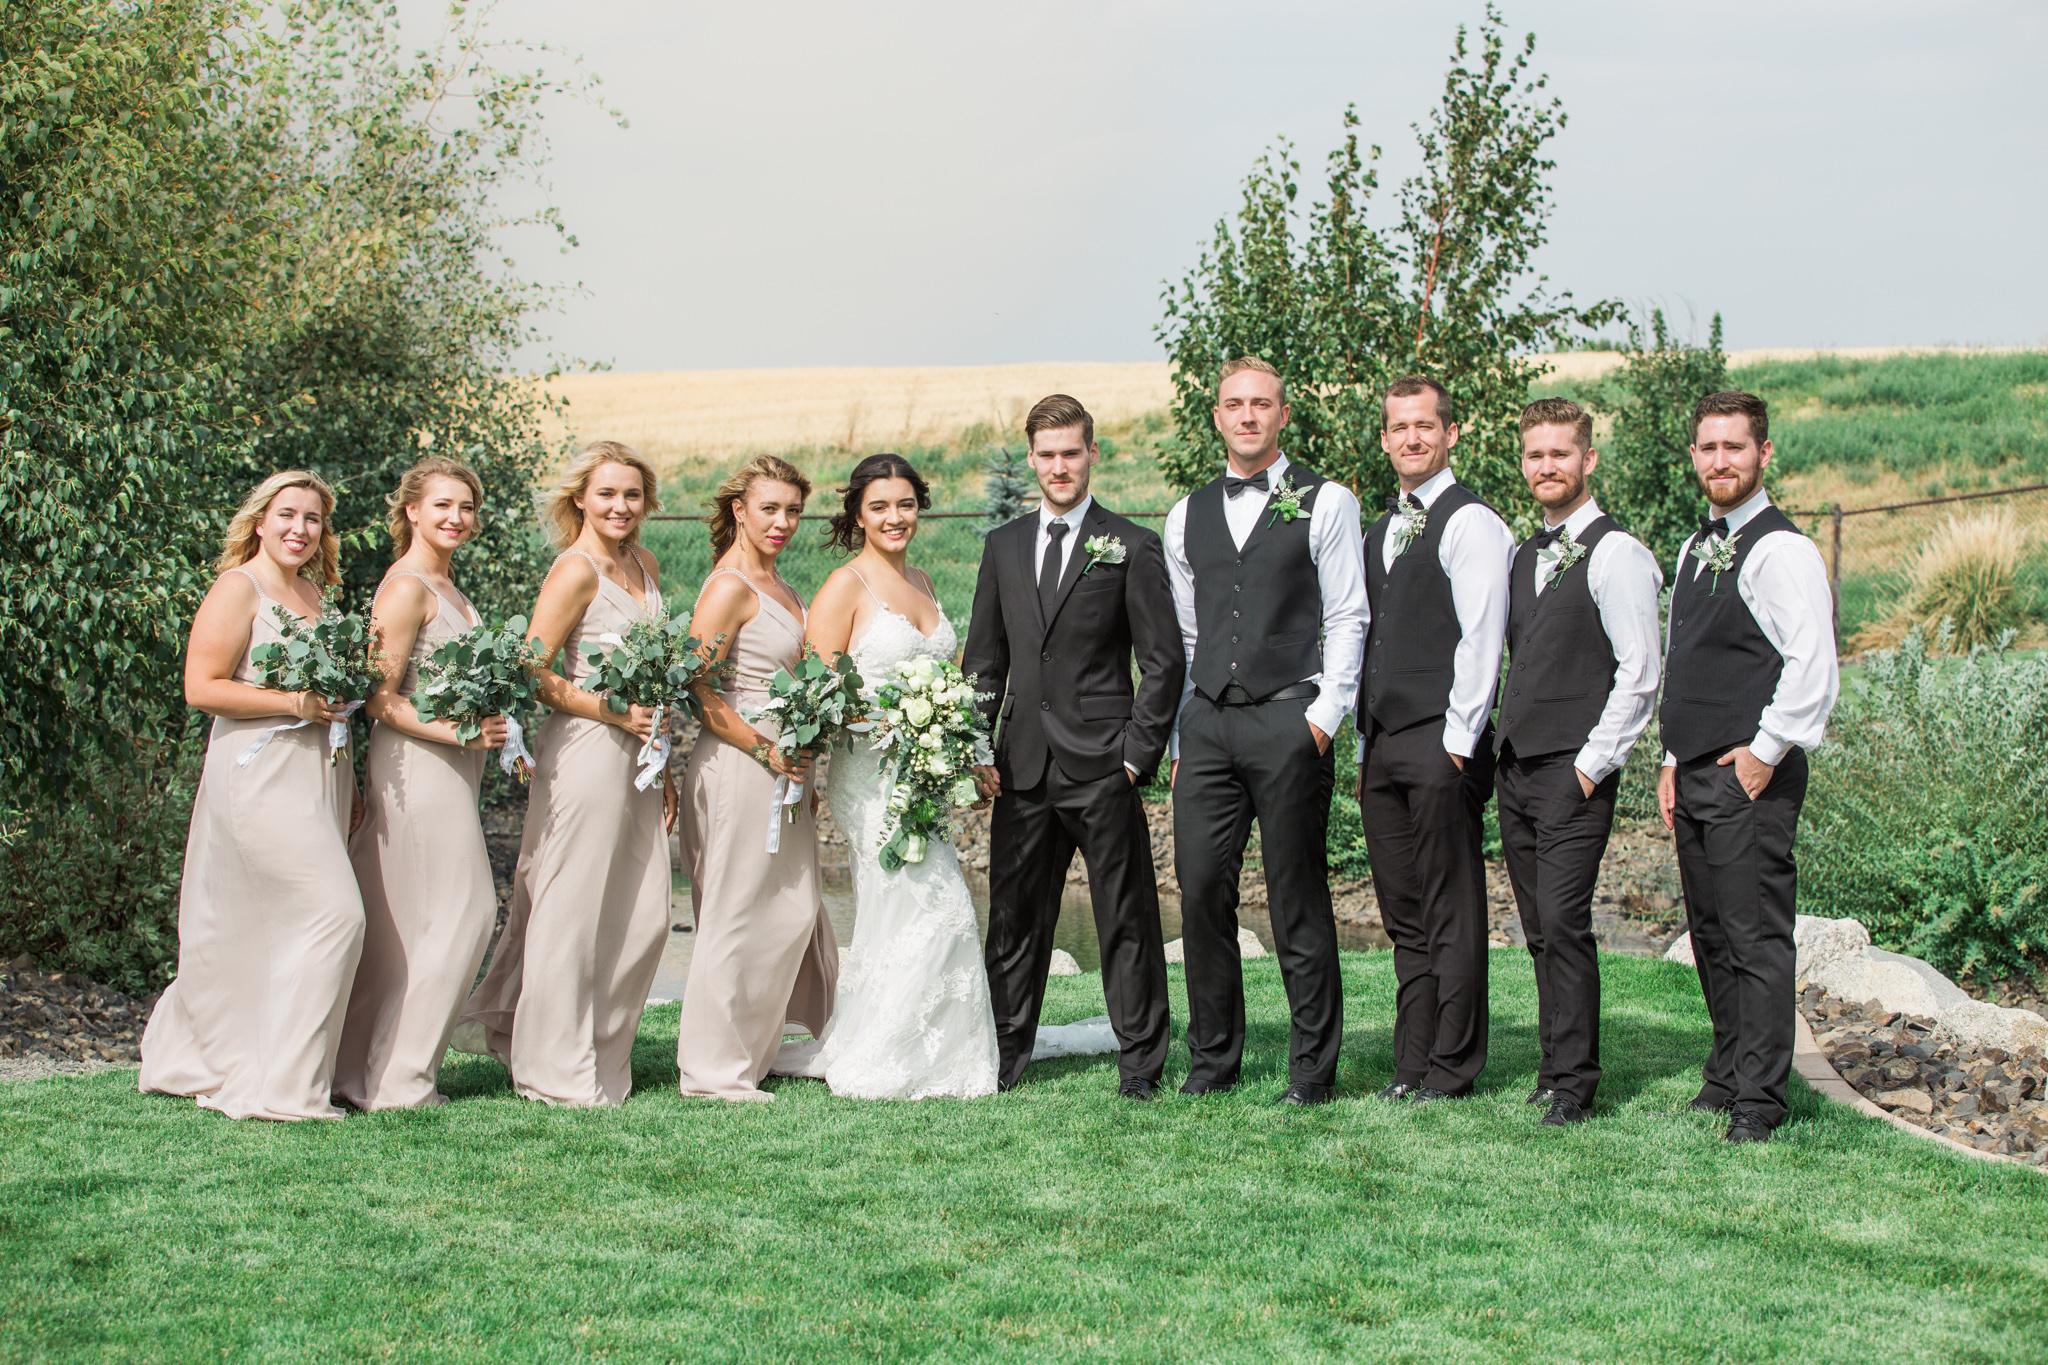 Olga_janni_wedding_090917_WEBSIZE (165 of 704).JPG